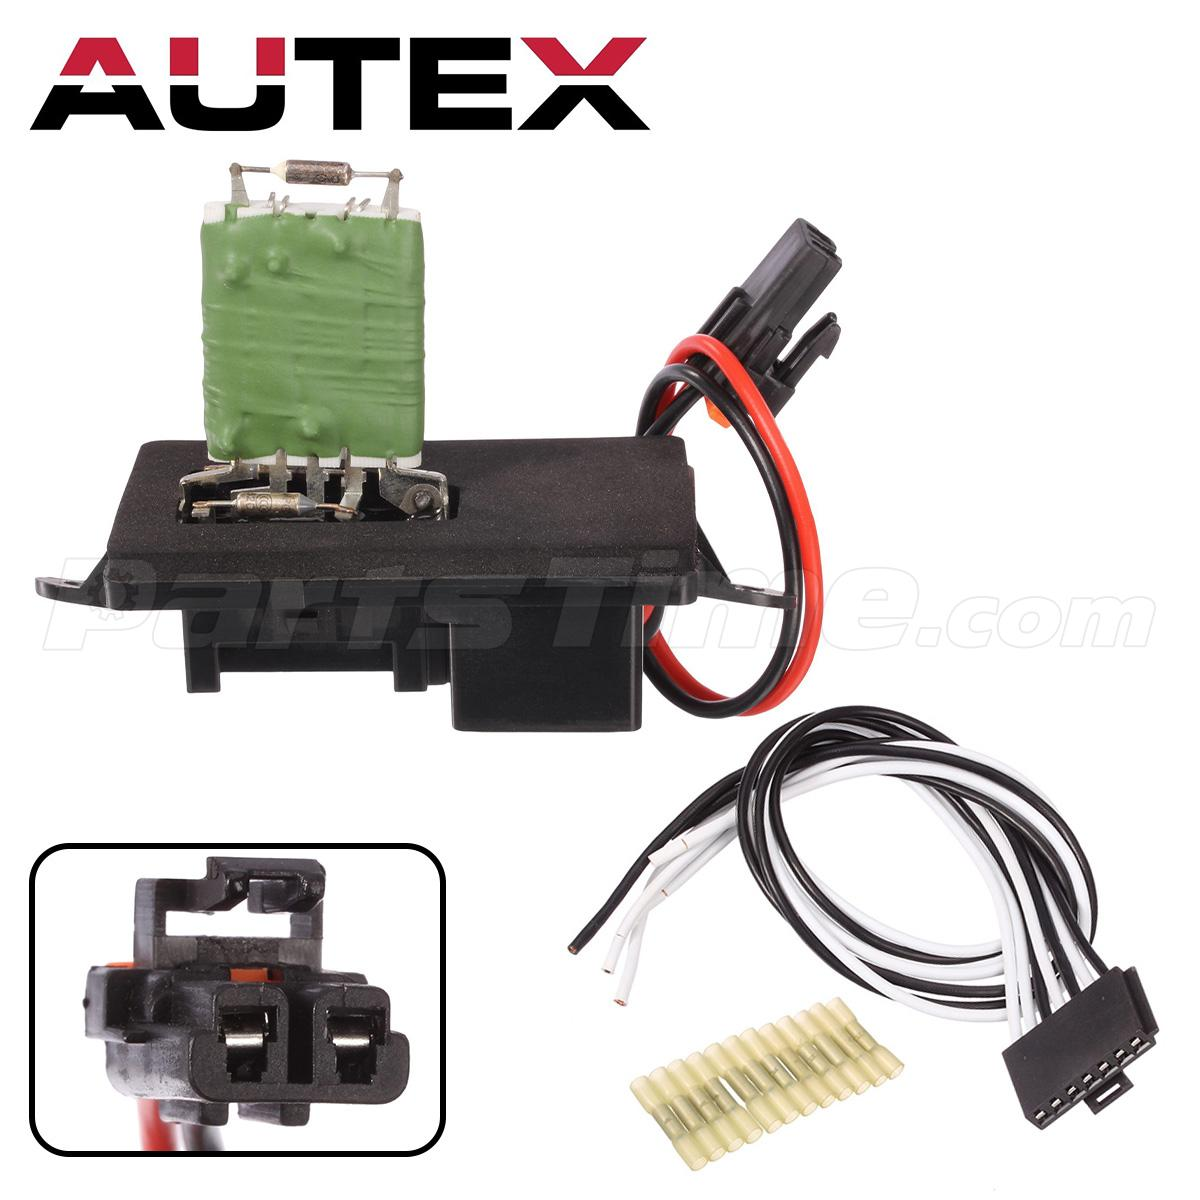 Cbt1c110 Blower Motor Wiring Harness Content Resource Of 2000 Silverado Resistor Wire Data Schema U2022 Rh Vsetop Co 2003 Dakota